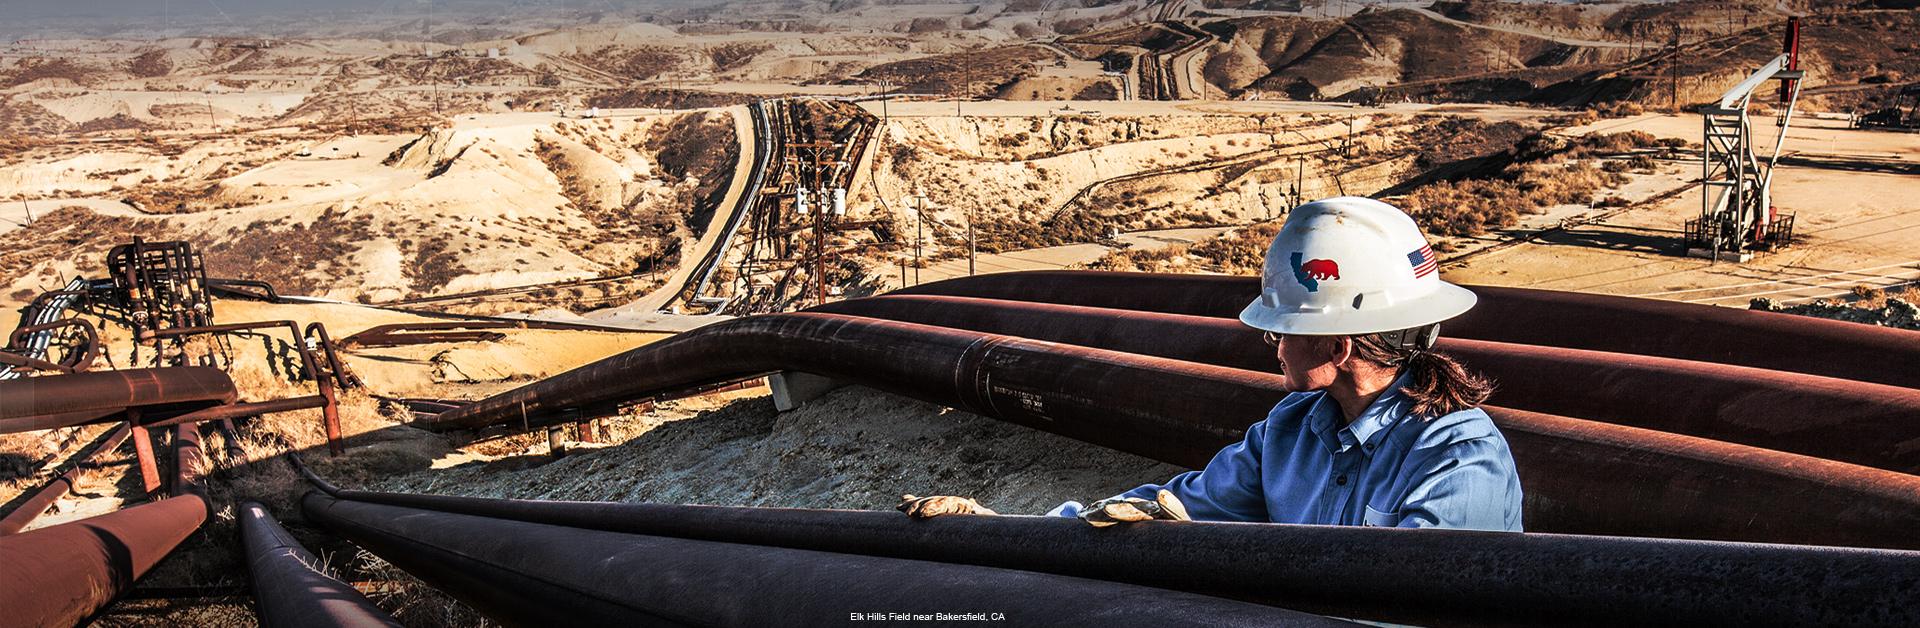 California Resources Corporation's Jobs In California, USA